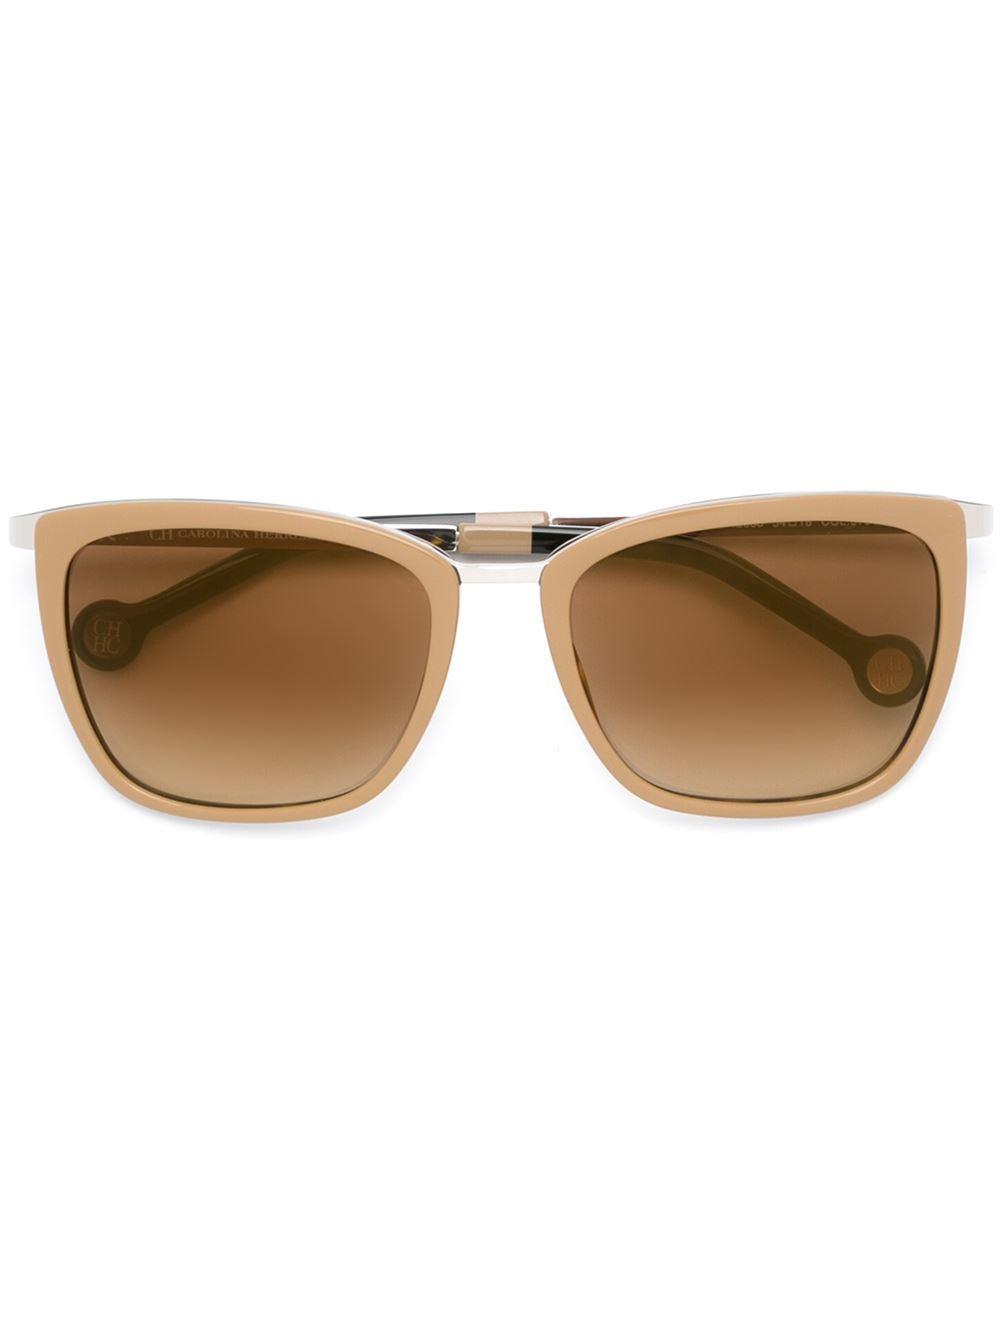 Lyst - Carolina Herrera Square Frame Sunglasses-5725